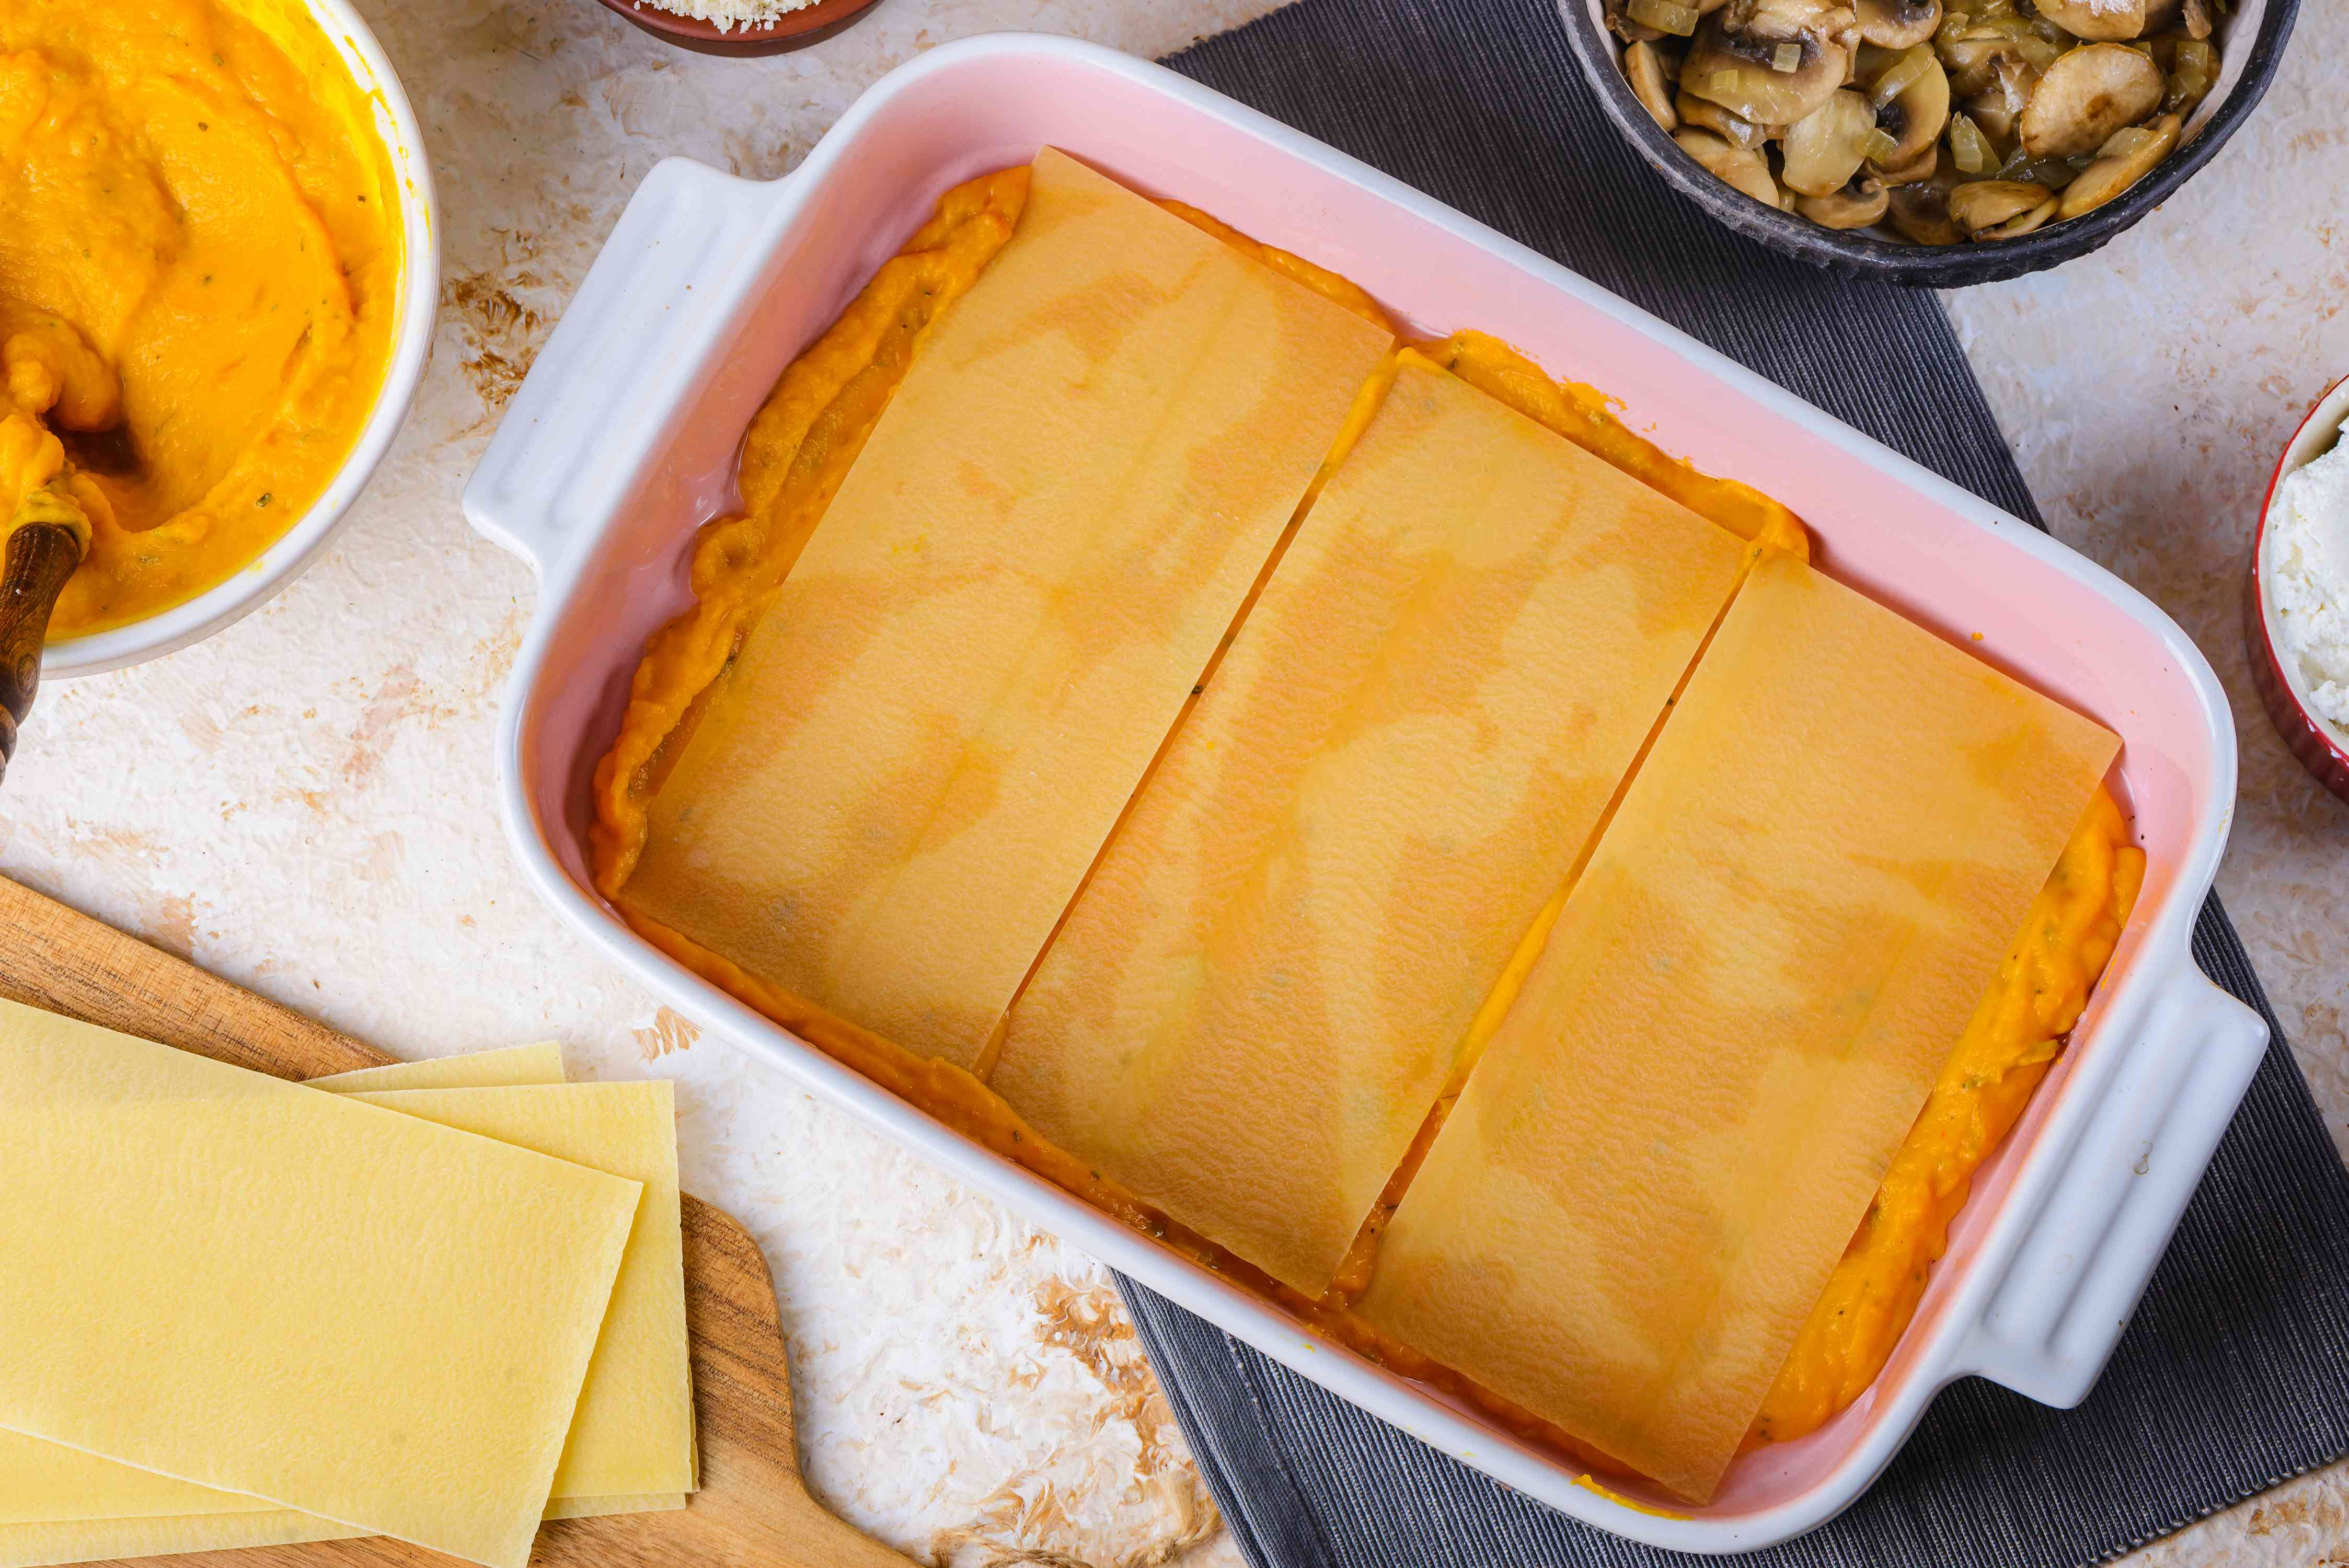 Spread pumpkin in baking dish